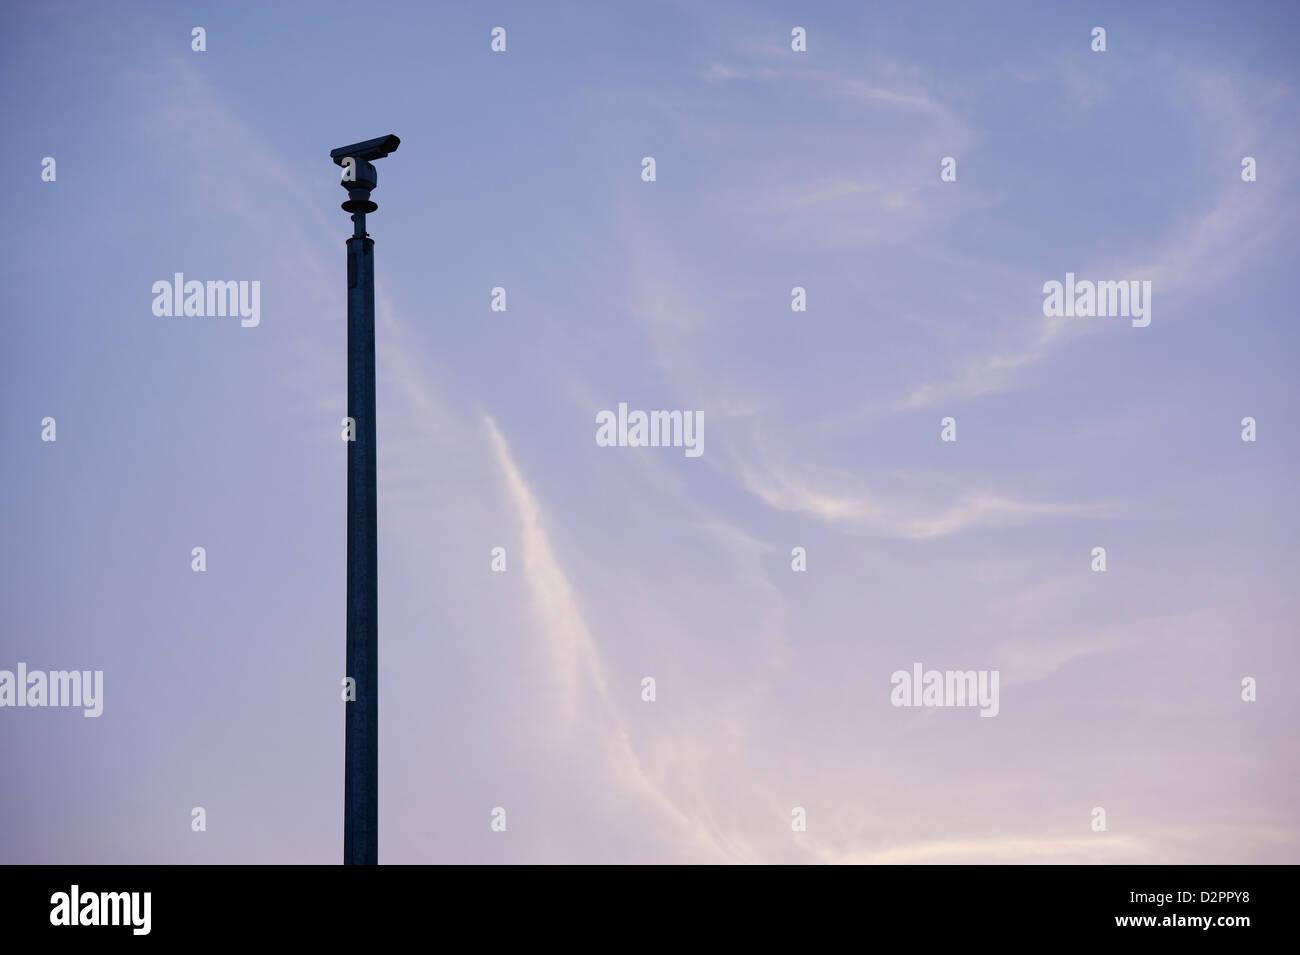 CCTV traffic monitoring camera - Stock Image